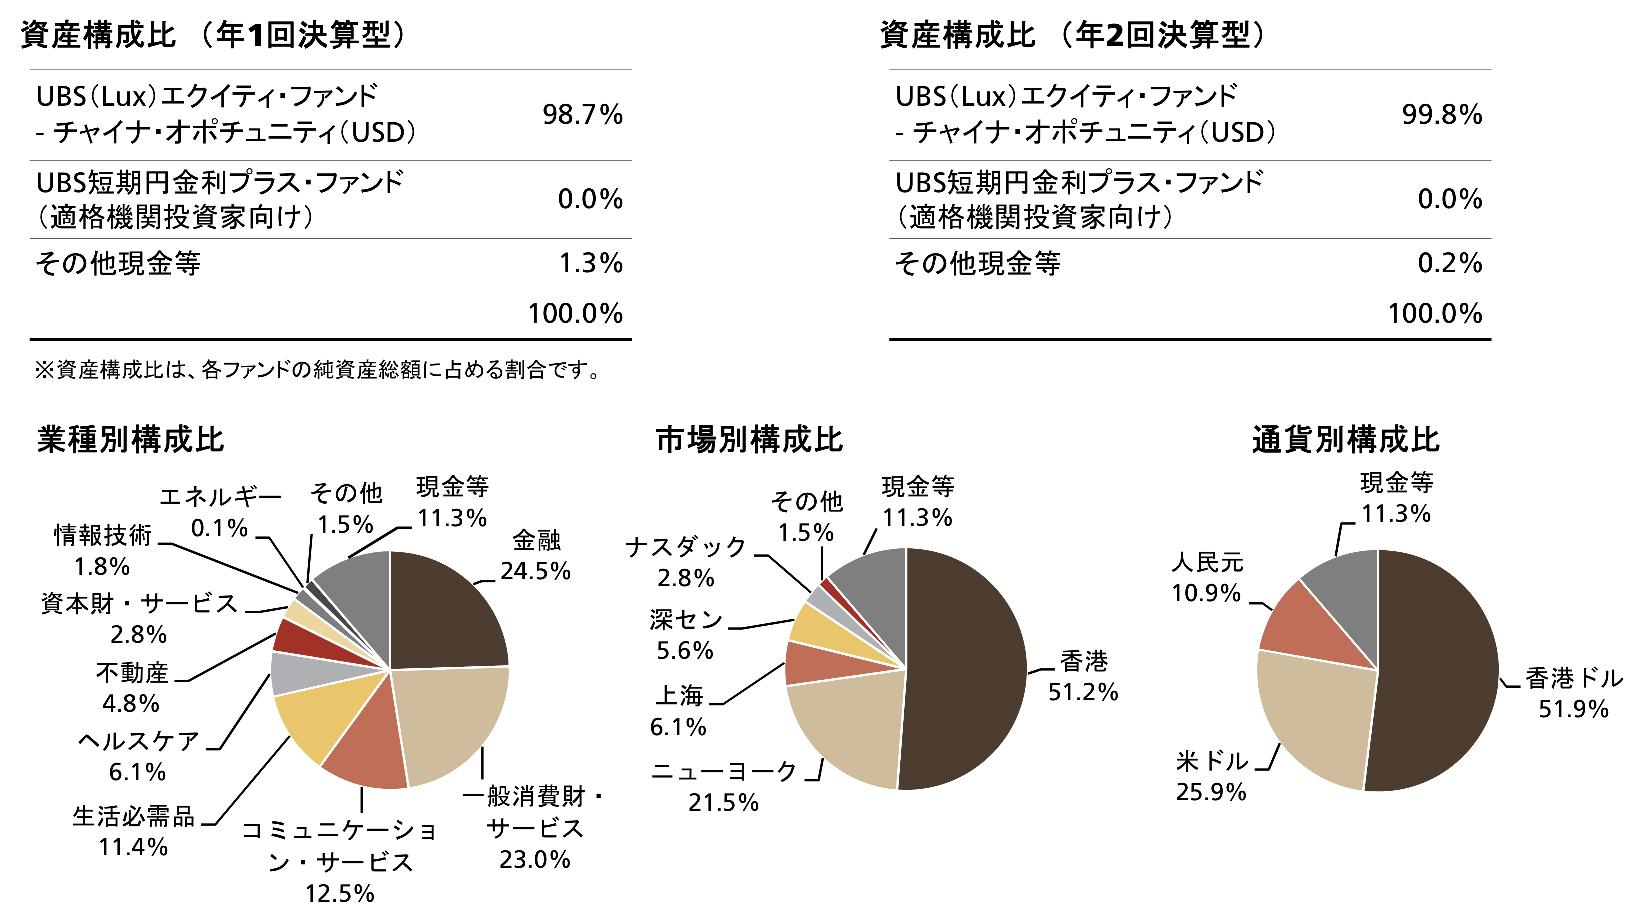 UBS中国新時代株式ファンドの投資ポーション